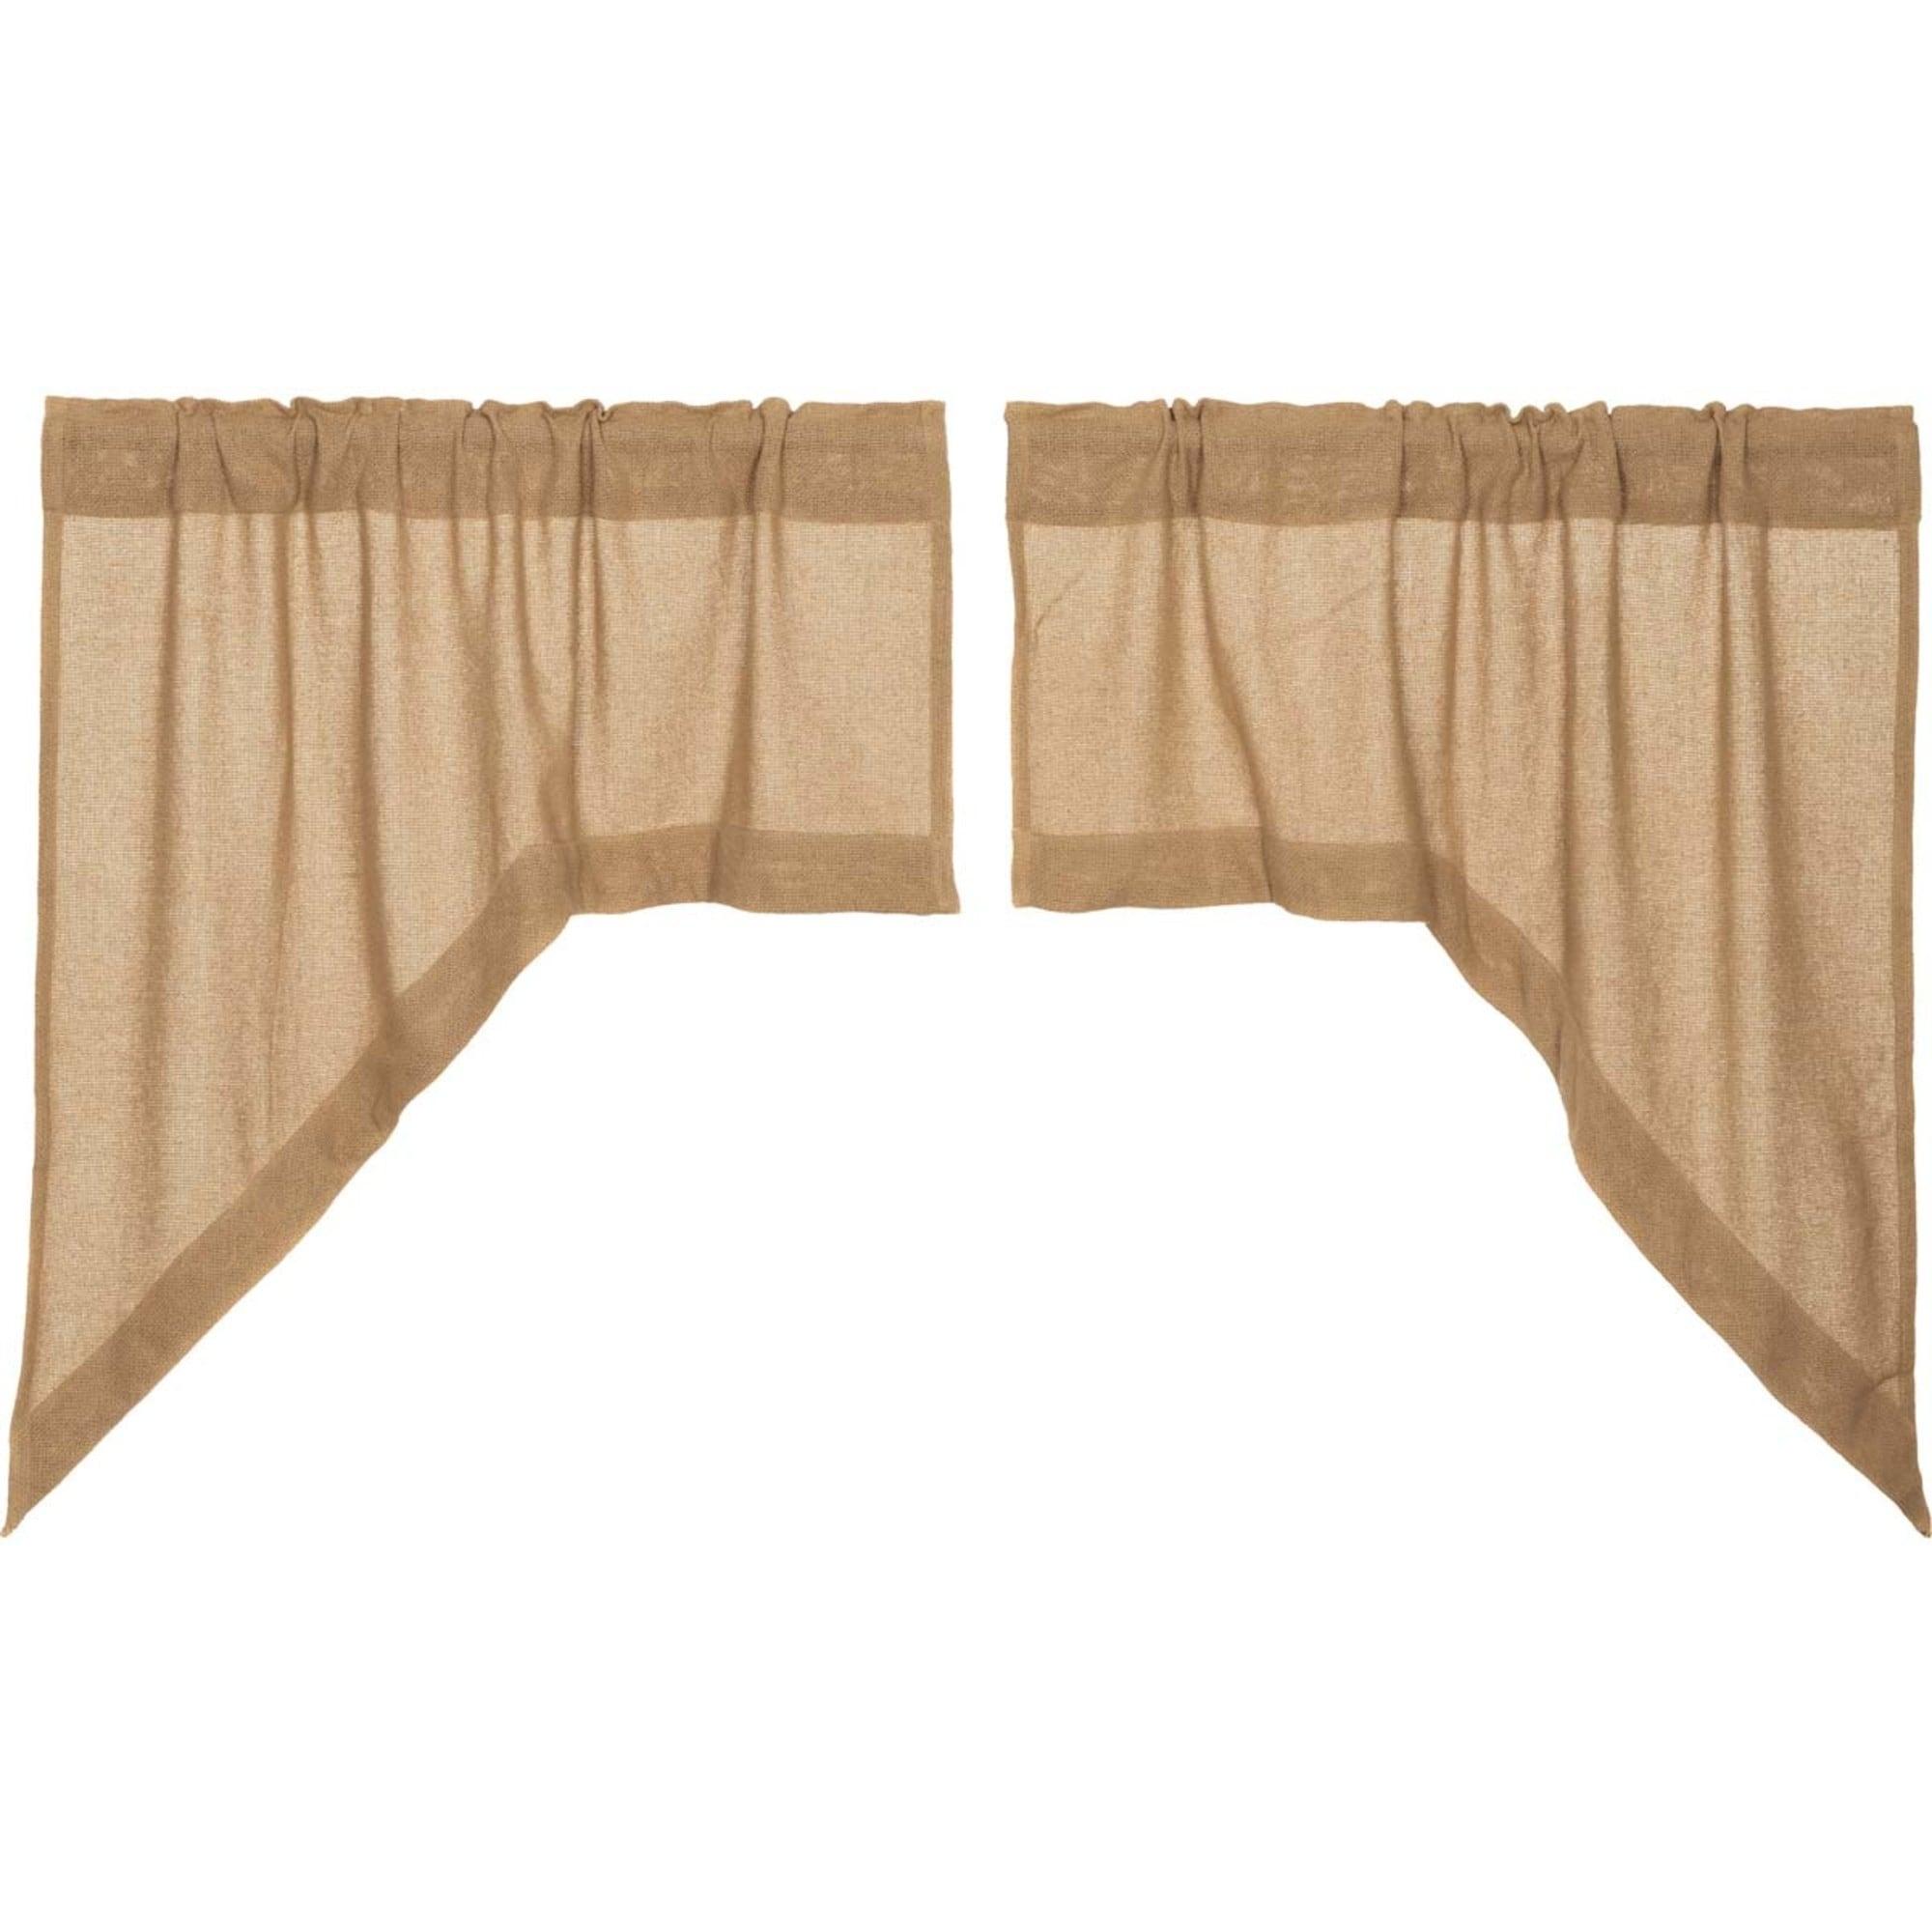 Window Treatments Hardware Vhc Farmhouse Kitchen Curtain Swag Set Country Cotton Burlap Drapes 3 Colors Home Garden Mbln Org